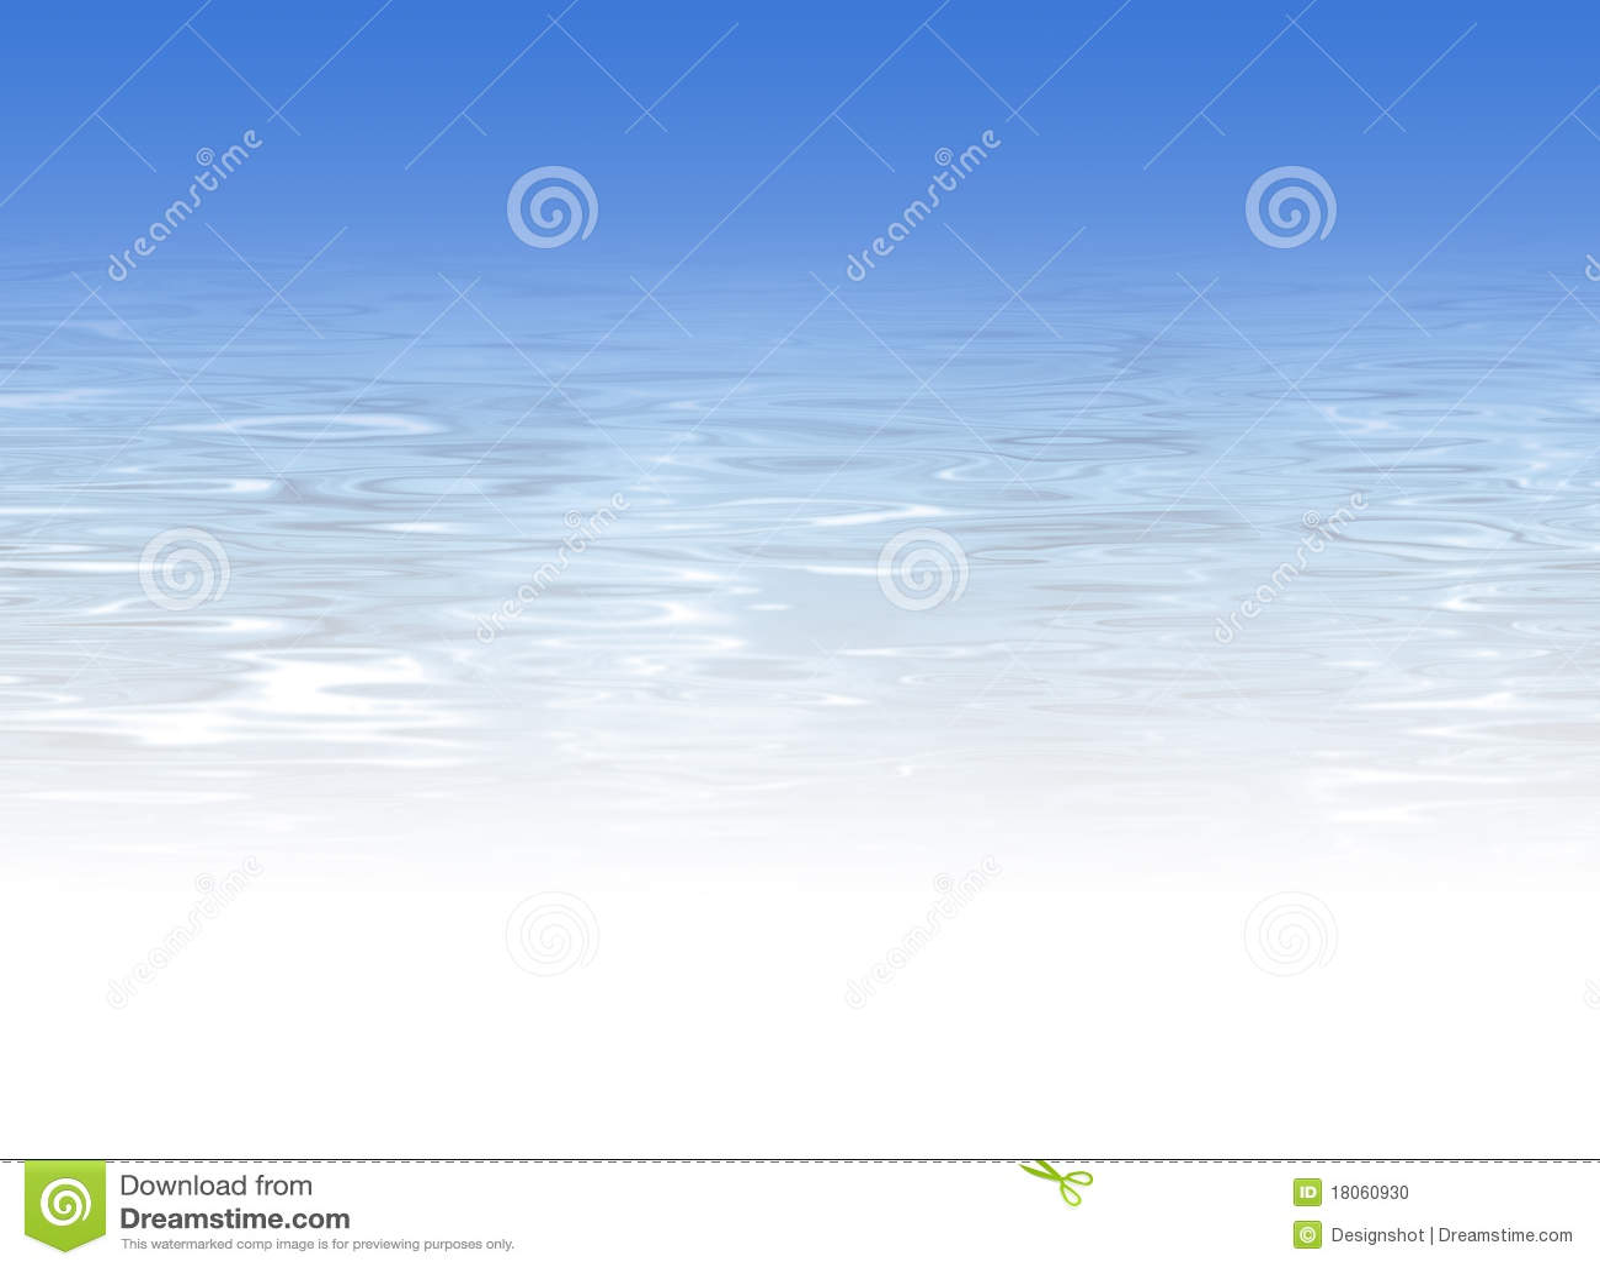 Light Blue Water Background